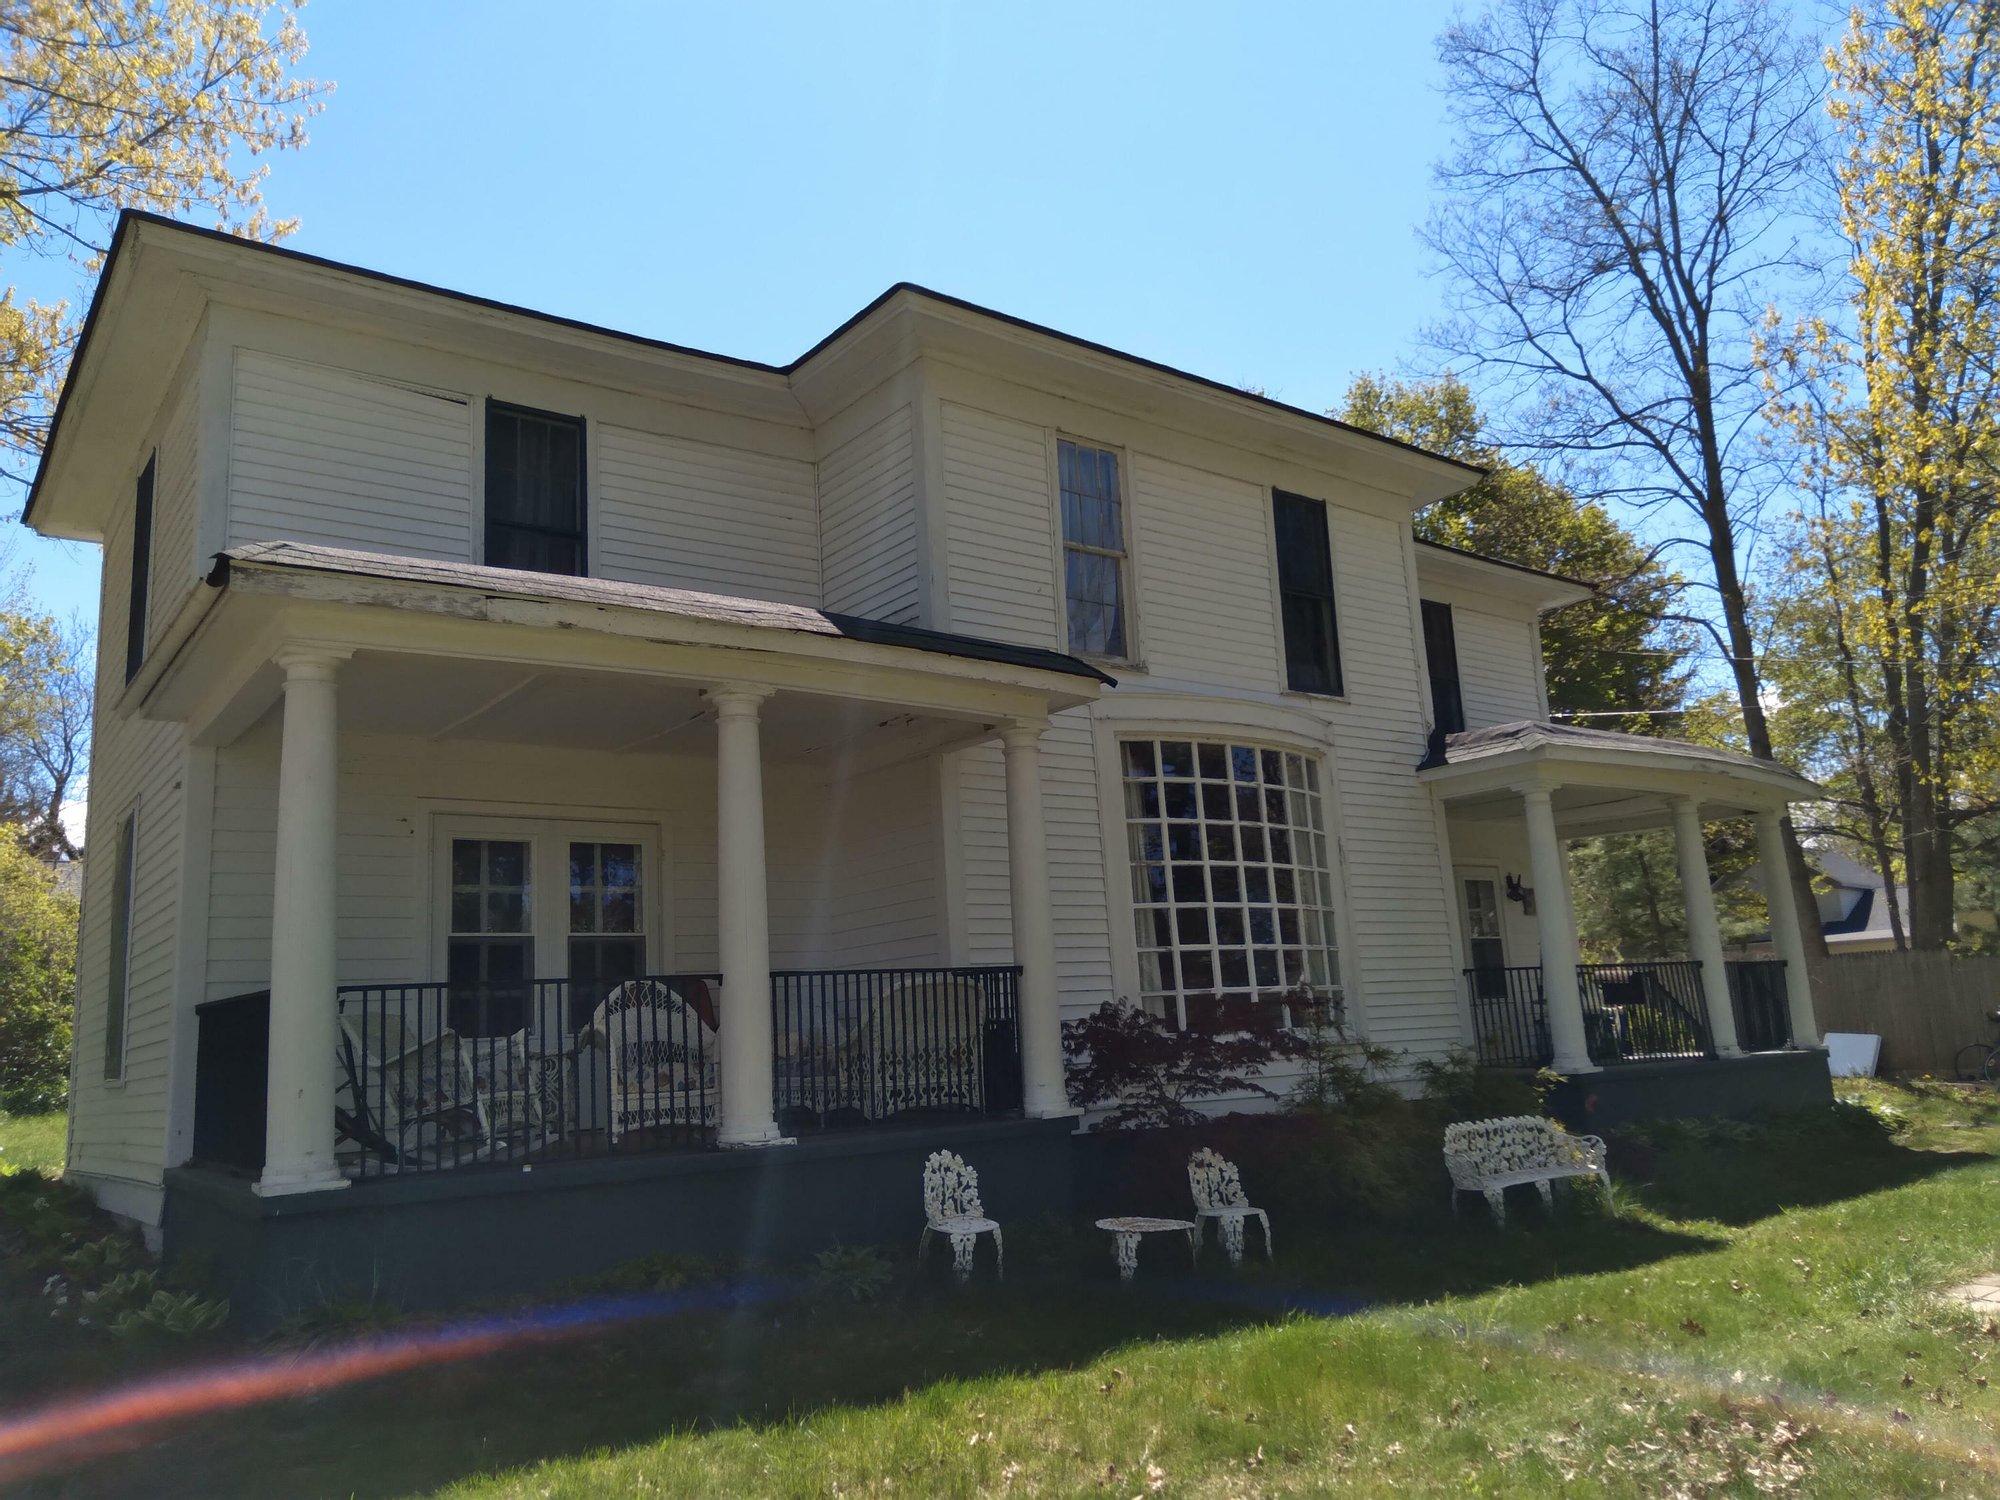 Casa a Saugatuck, Michigan, Stati Uniti 1 - 11447886